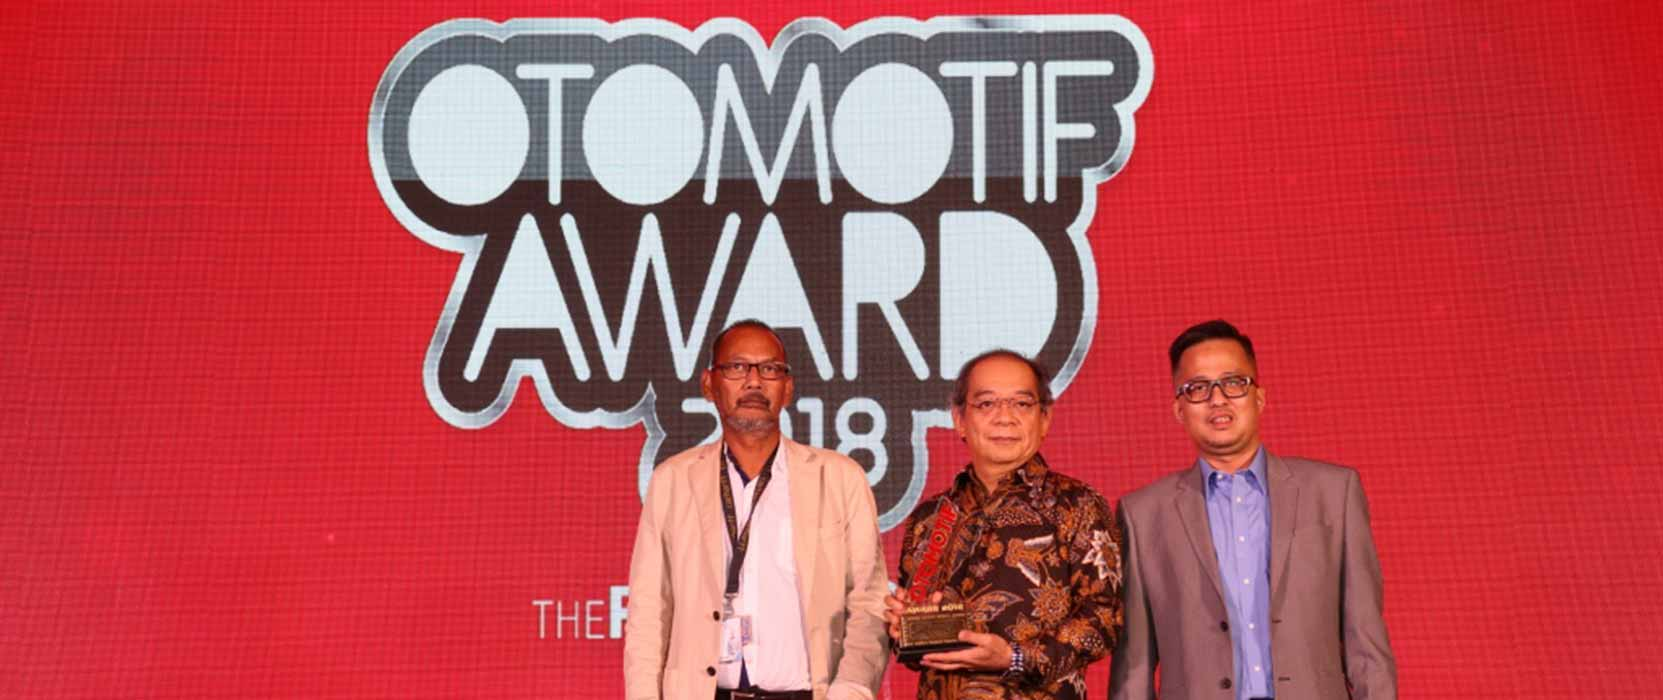 Honda PCX - Bike of the Year - Otomotif Award 2018